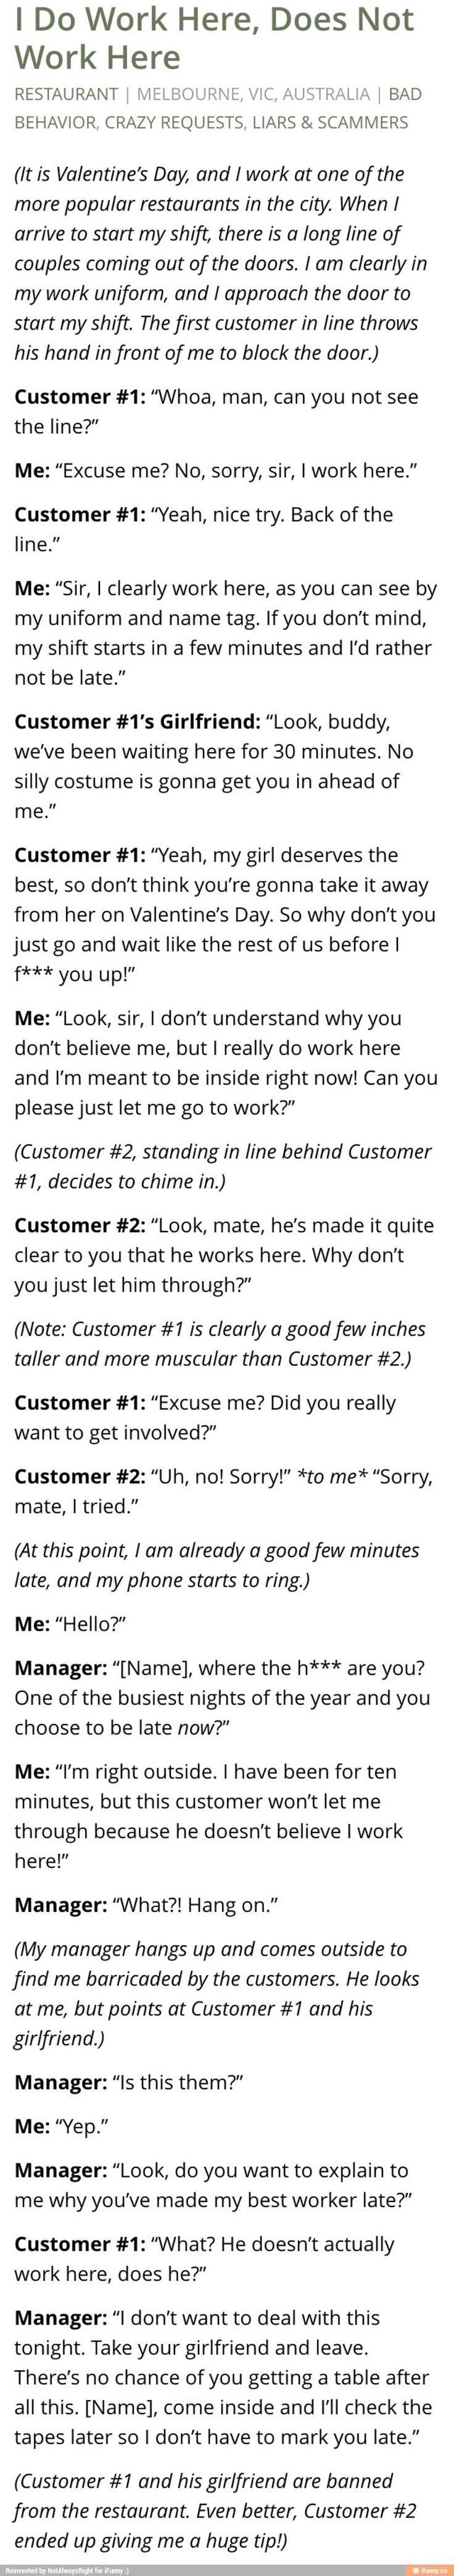 Sad... jackasses & assholes no matter where you go... Good guy customer #2 though!